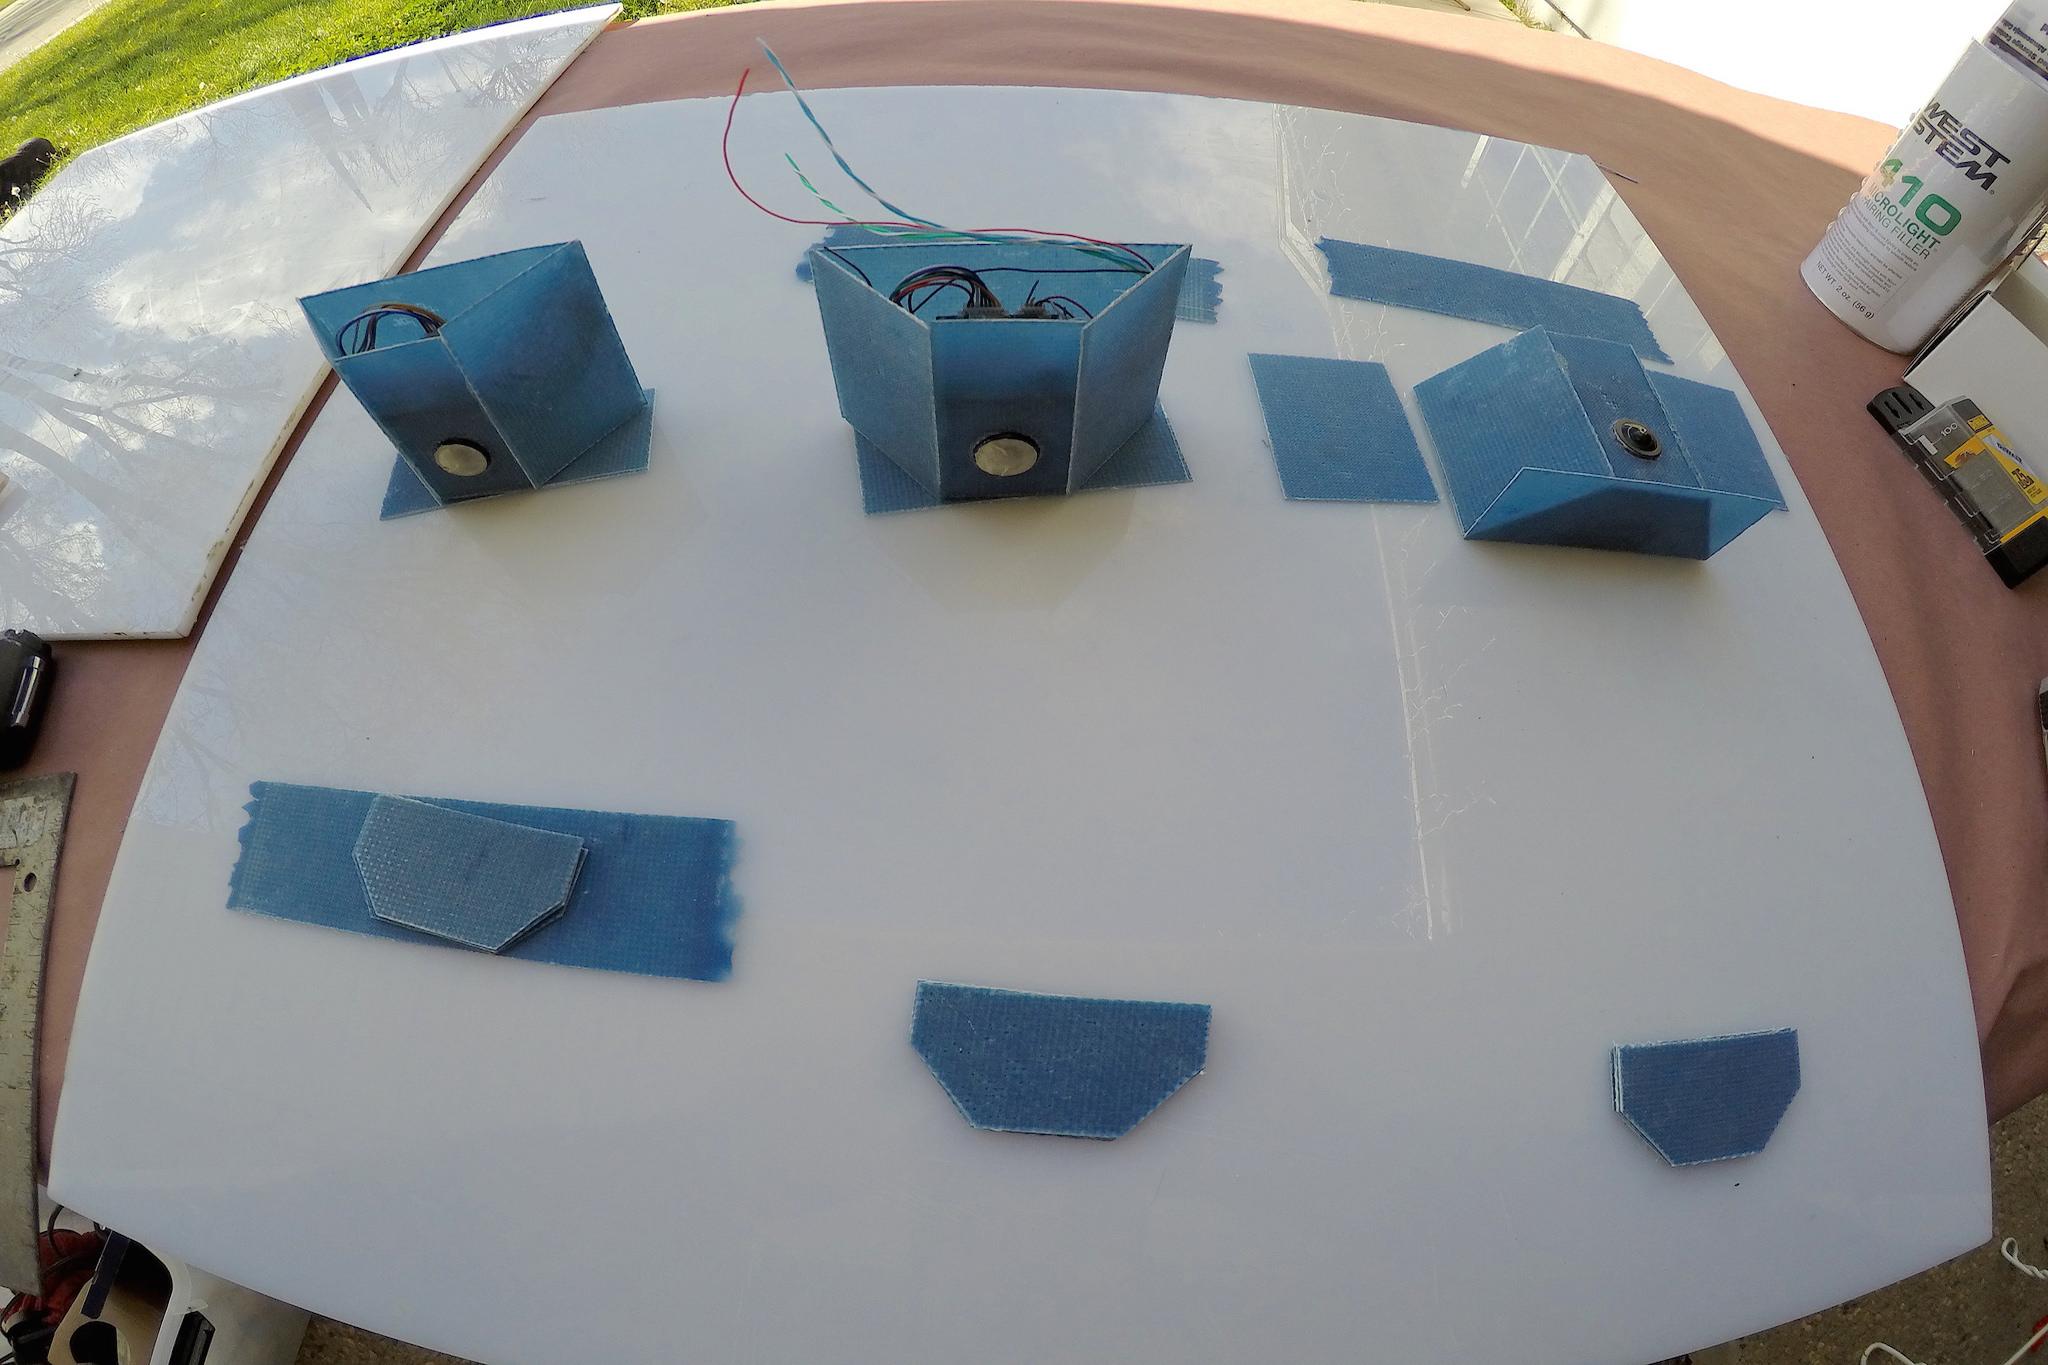 Cameras in Process